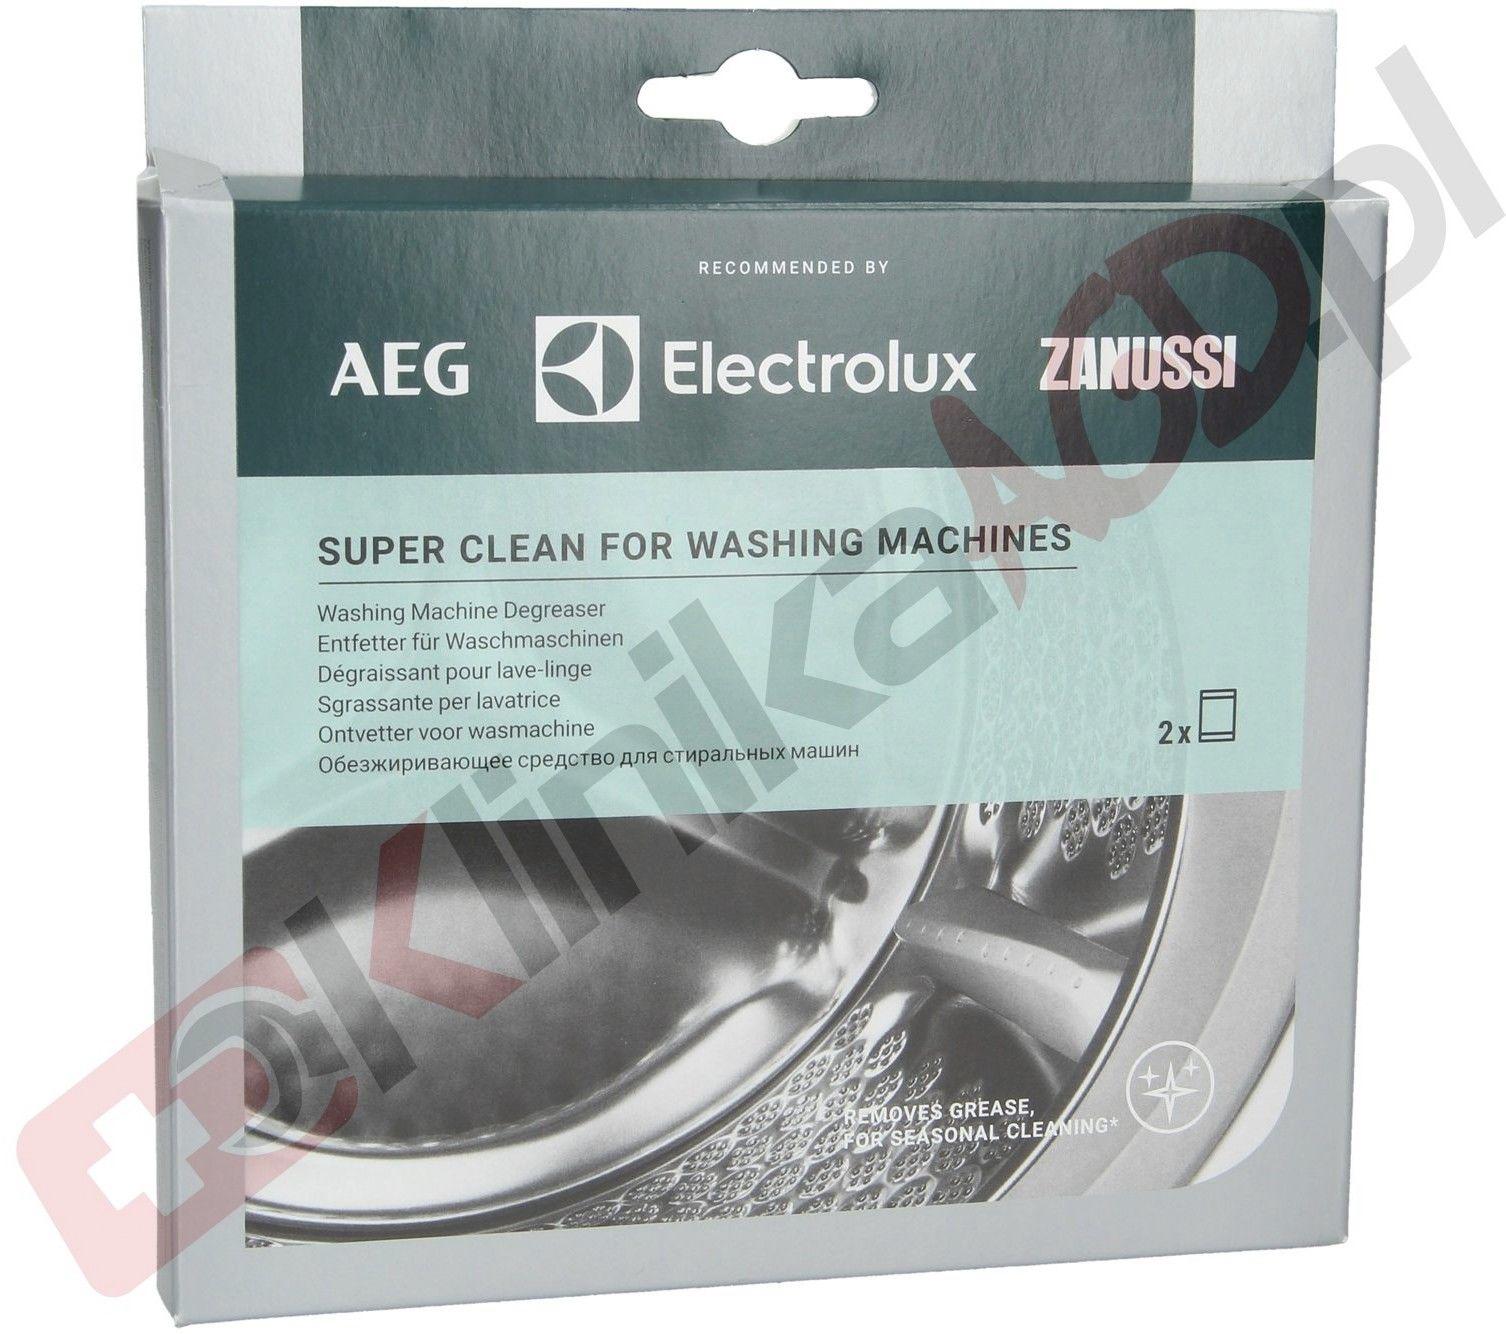 Środek czyszczący Electrolux super clean do pralki proszek 50g 2szt Electrolux